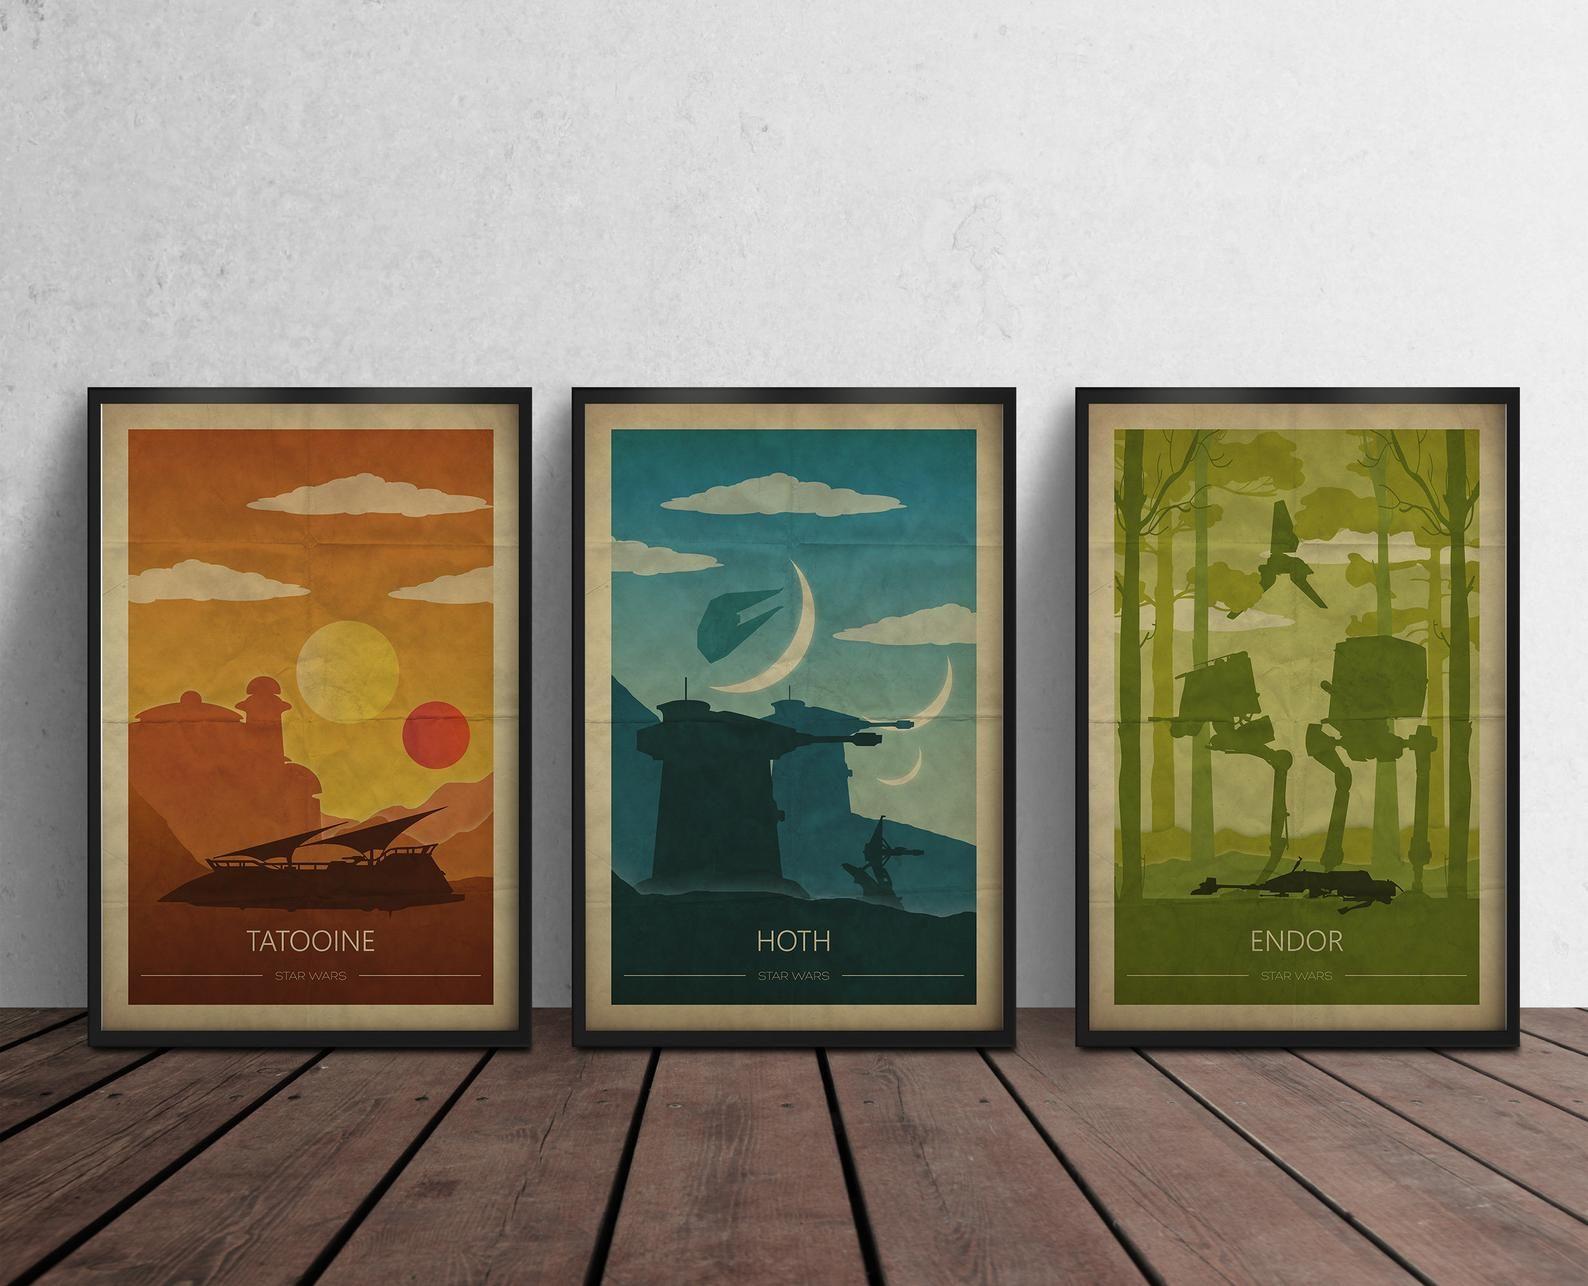 Star Wars Poster Wall Art Decor Print Gift Tatooine Endor Hoth Etsy Wall Art Decor Prints Star Wars Nursery Art Poster Wall Art